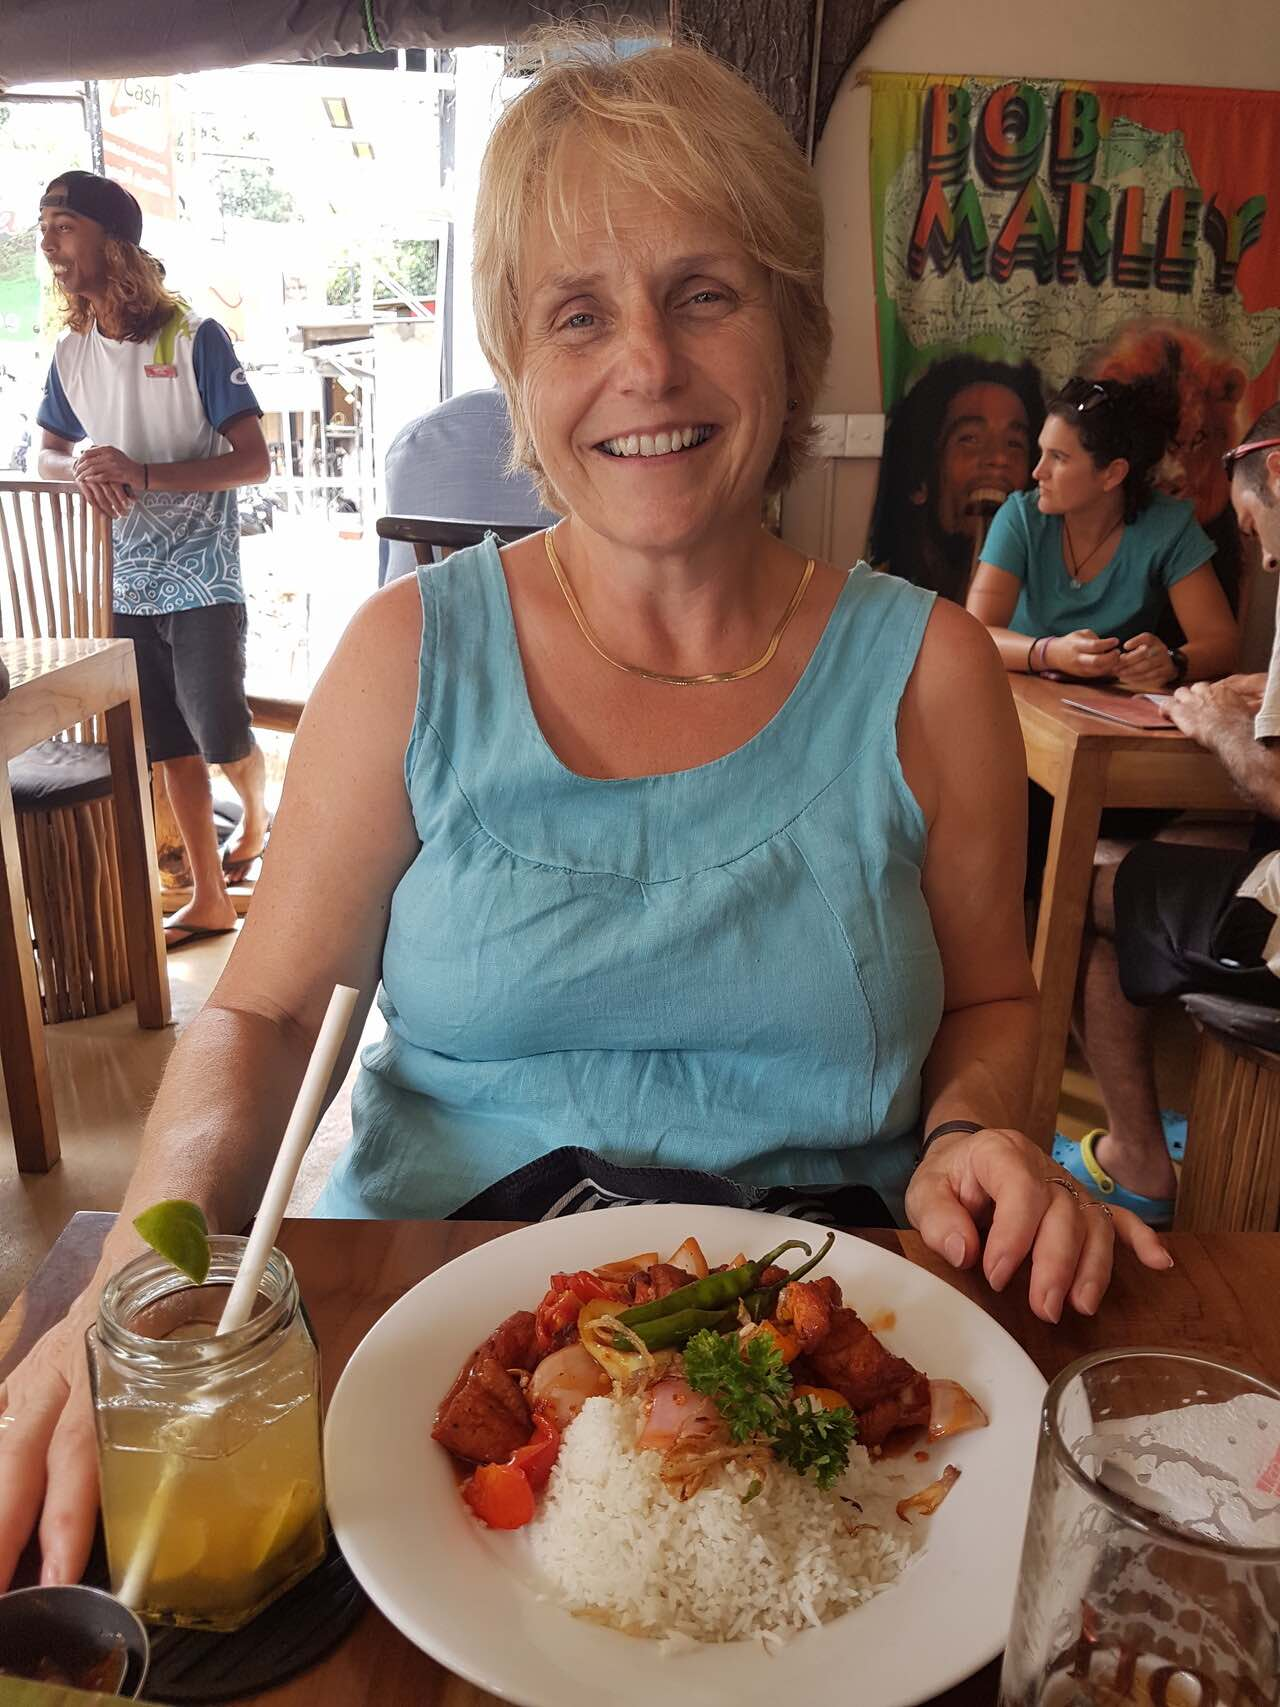 sri-lanka-local-restaurant-holiday-review-feedback-invite-to-paradise-quentin-kate-hulm.jpg